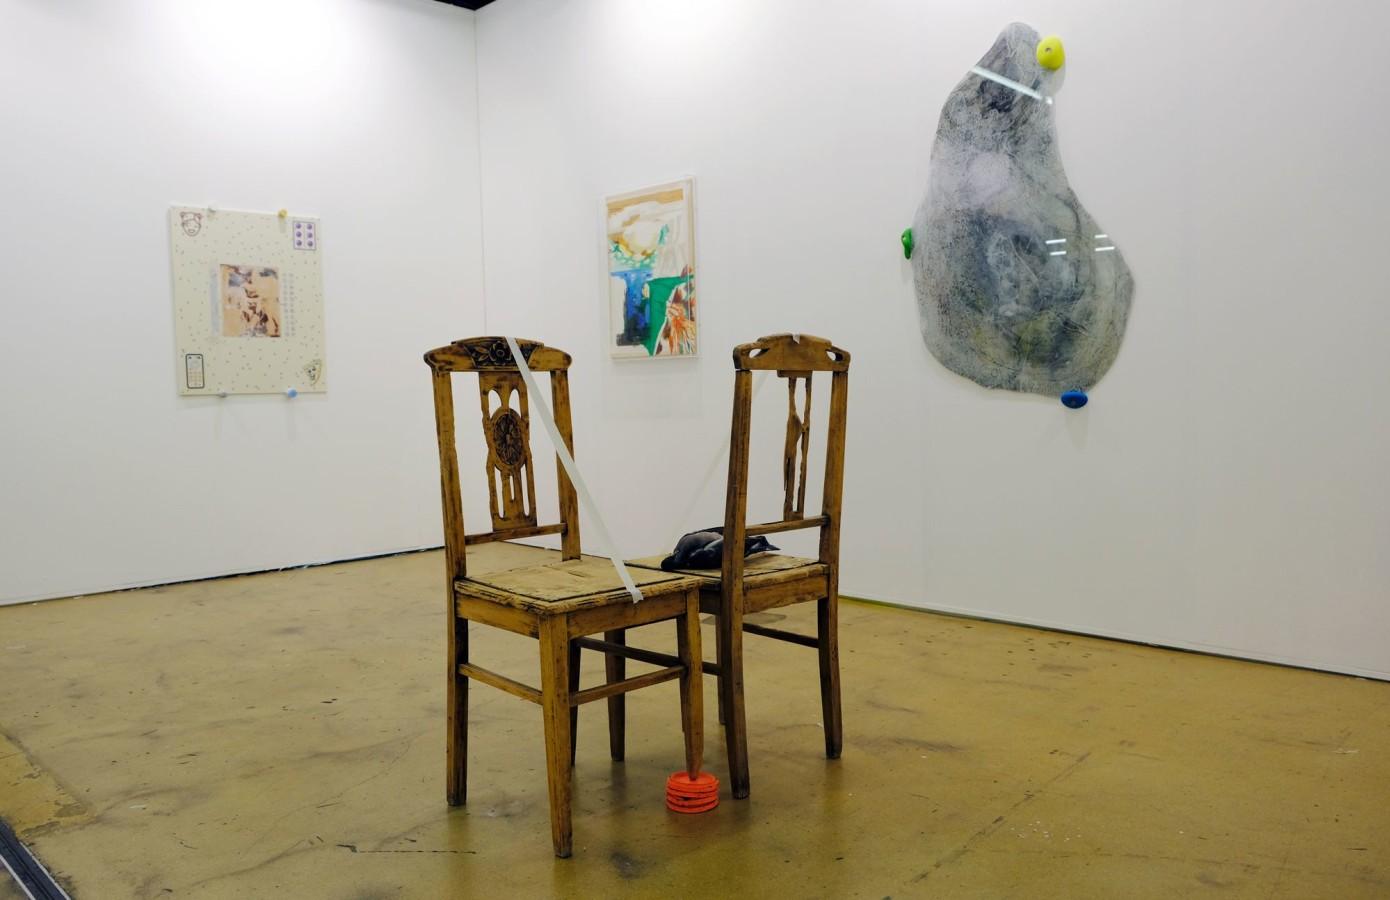 Art Rotterdam 2019, Christine Moldrickx, Janis Rafa, Juliaan Andeweg, Katja Mater, Marien Schouten, Navid Nuur, Pieter Engels,